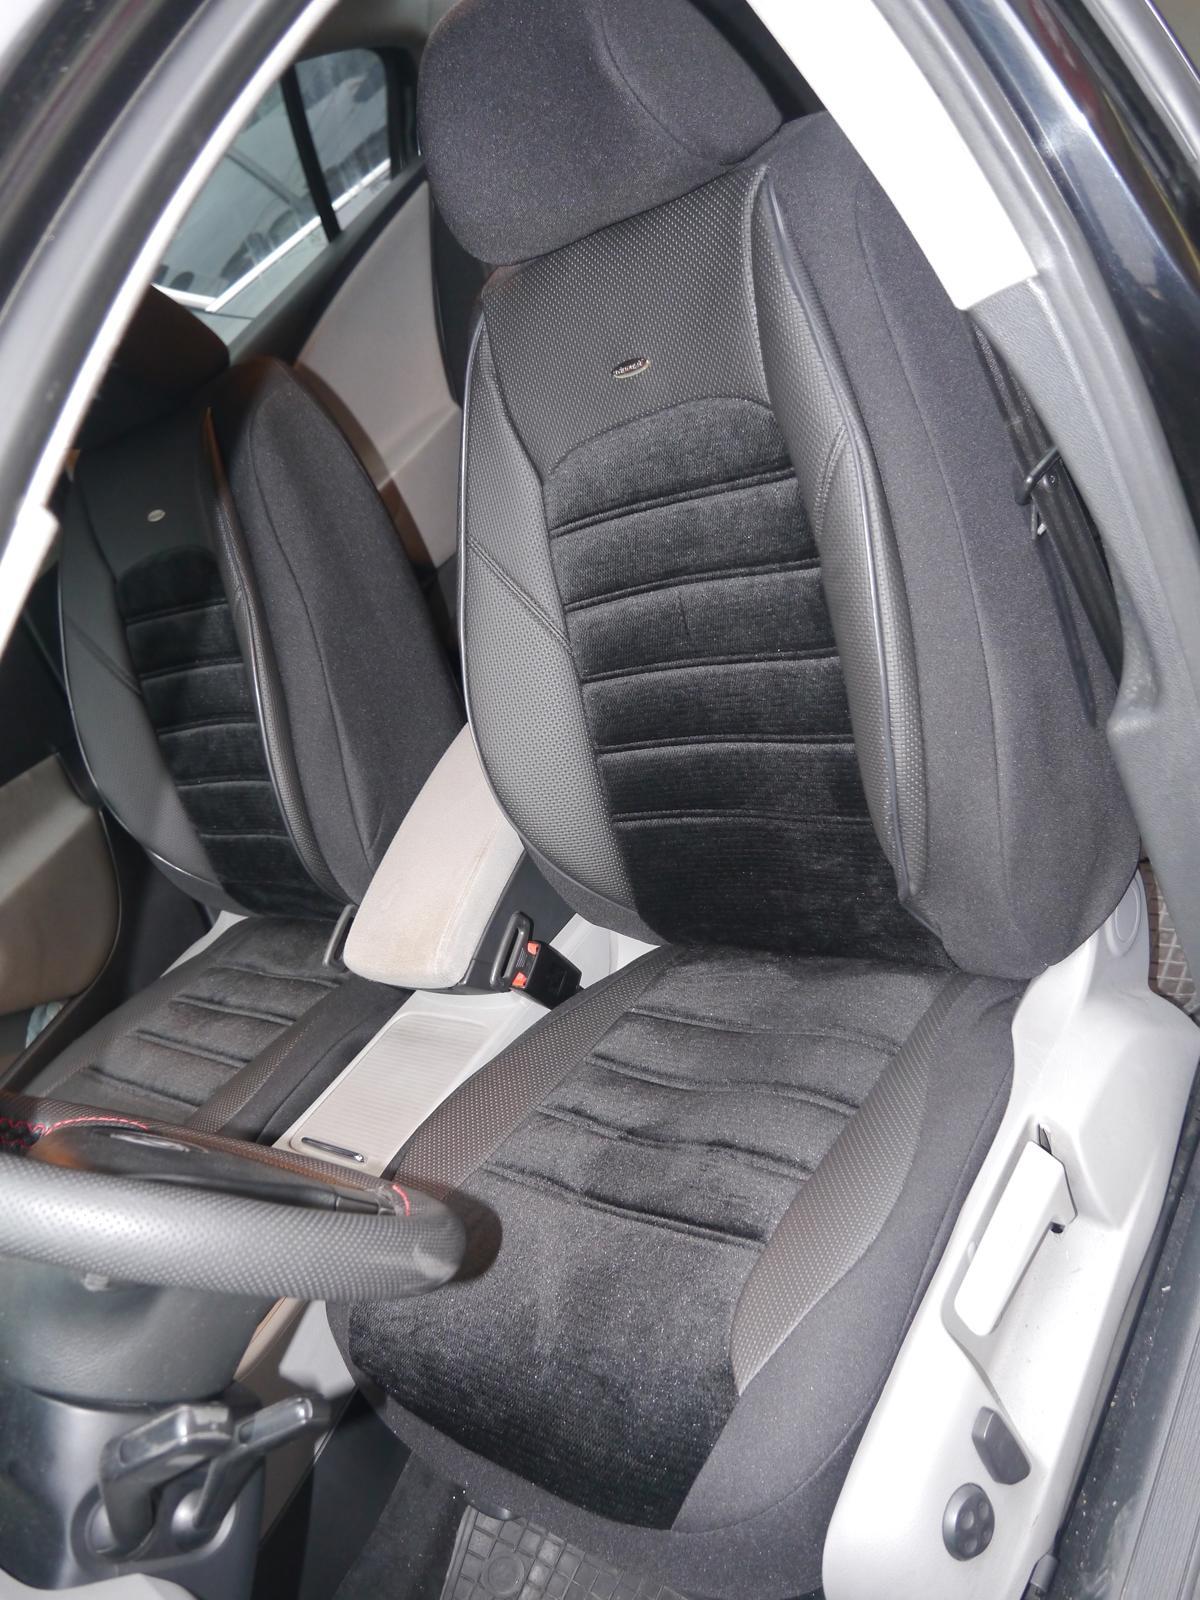 Car Seat Covers Protectors For Bmw X1 E84 No2a